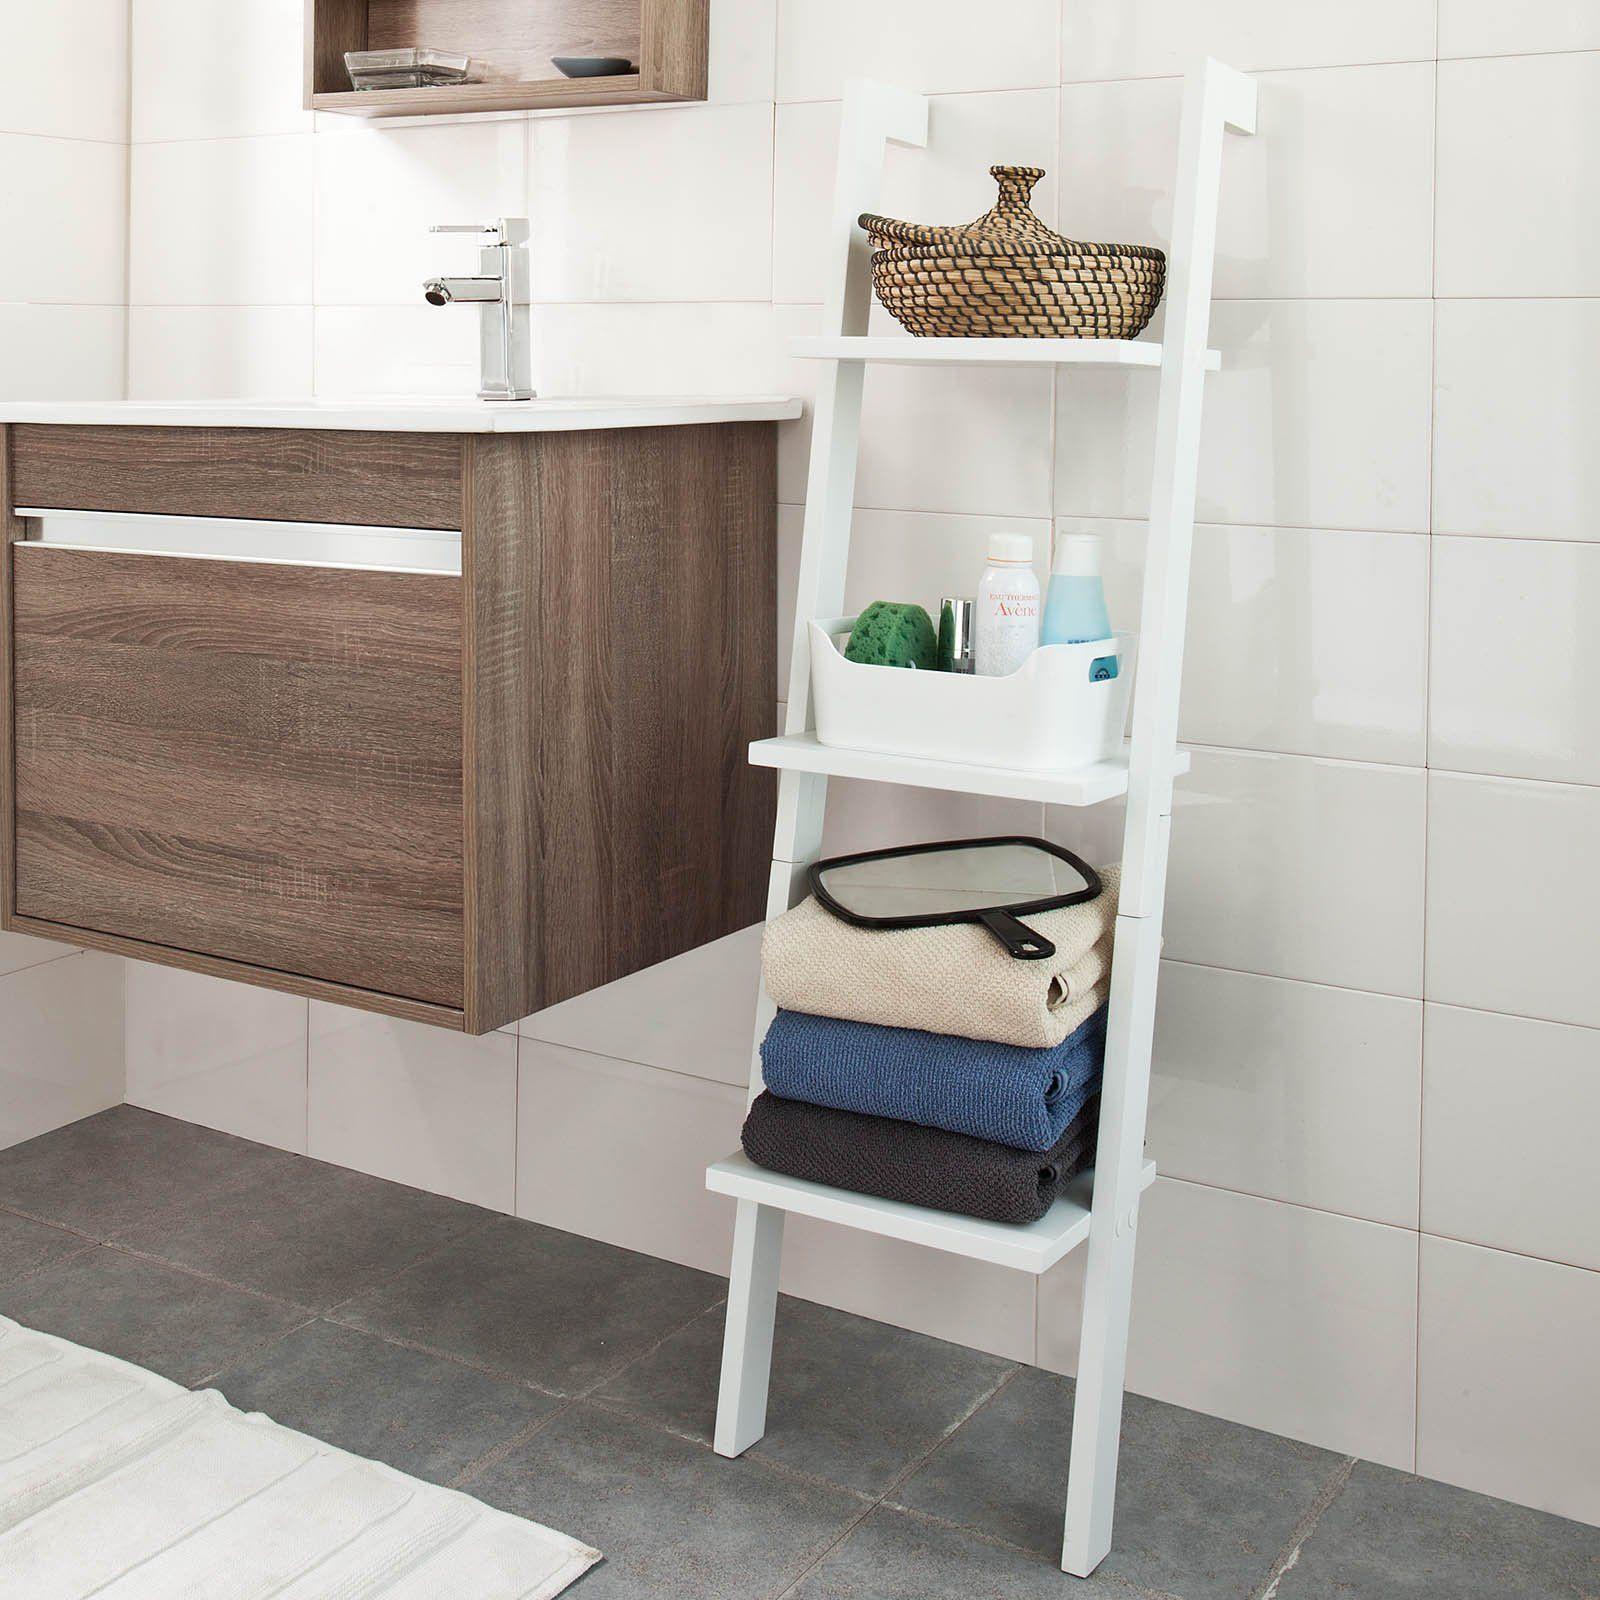 Sobuy frg32 sch tag re murale style chelle salle de bain tag re chelle d co meuble de for Echelle salle de bain